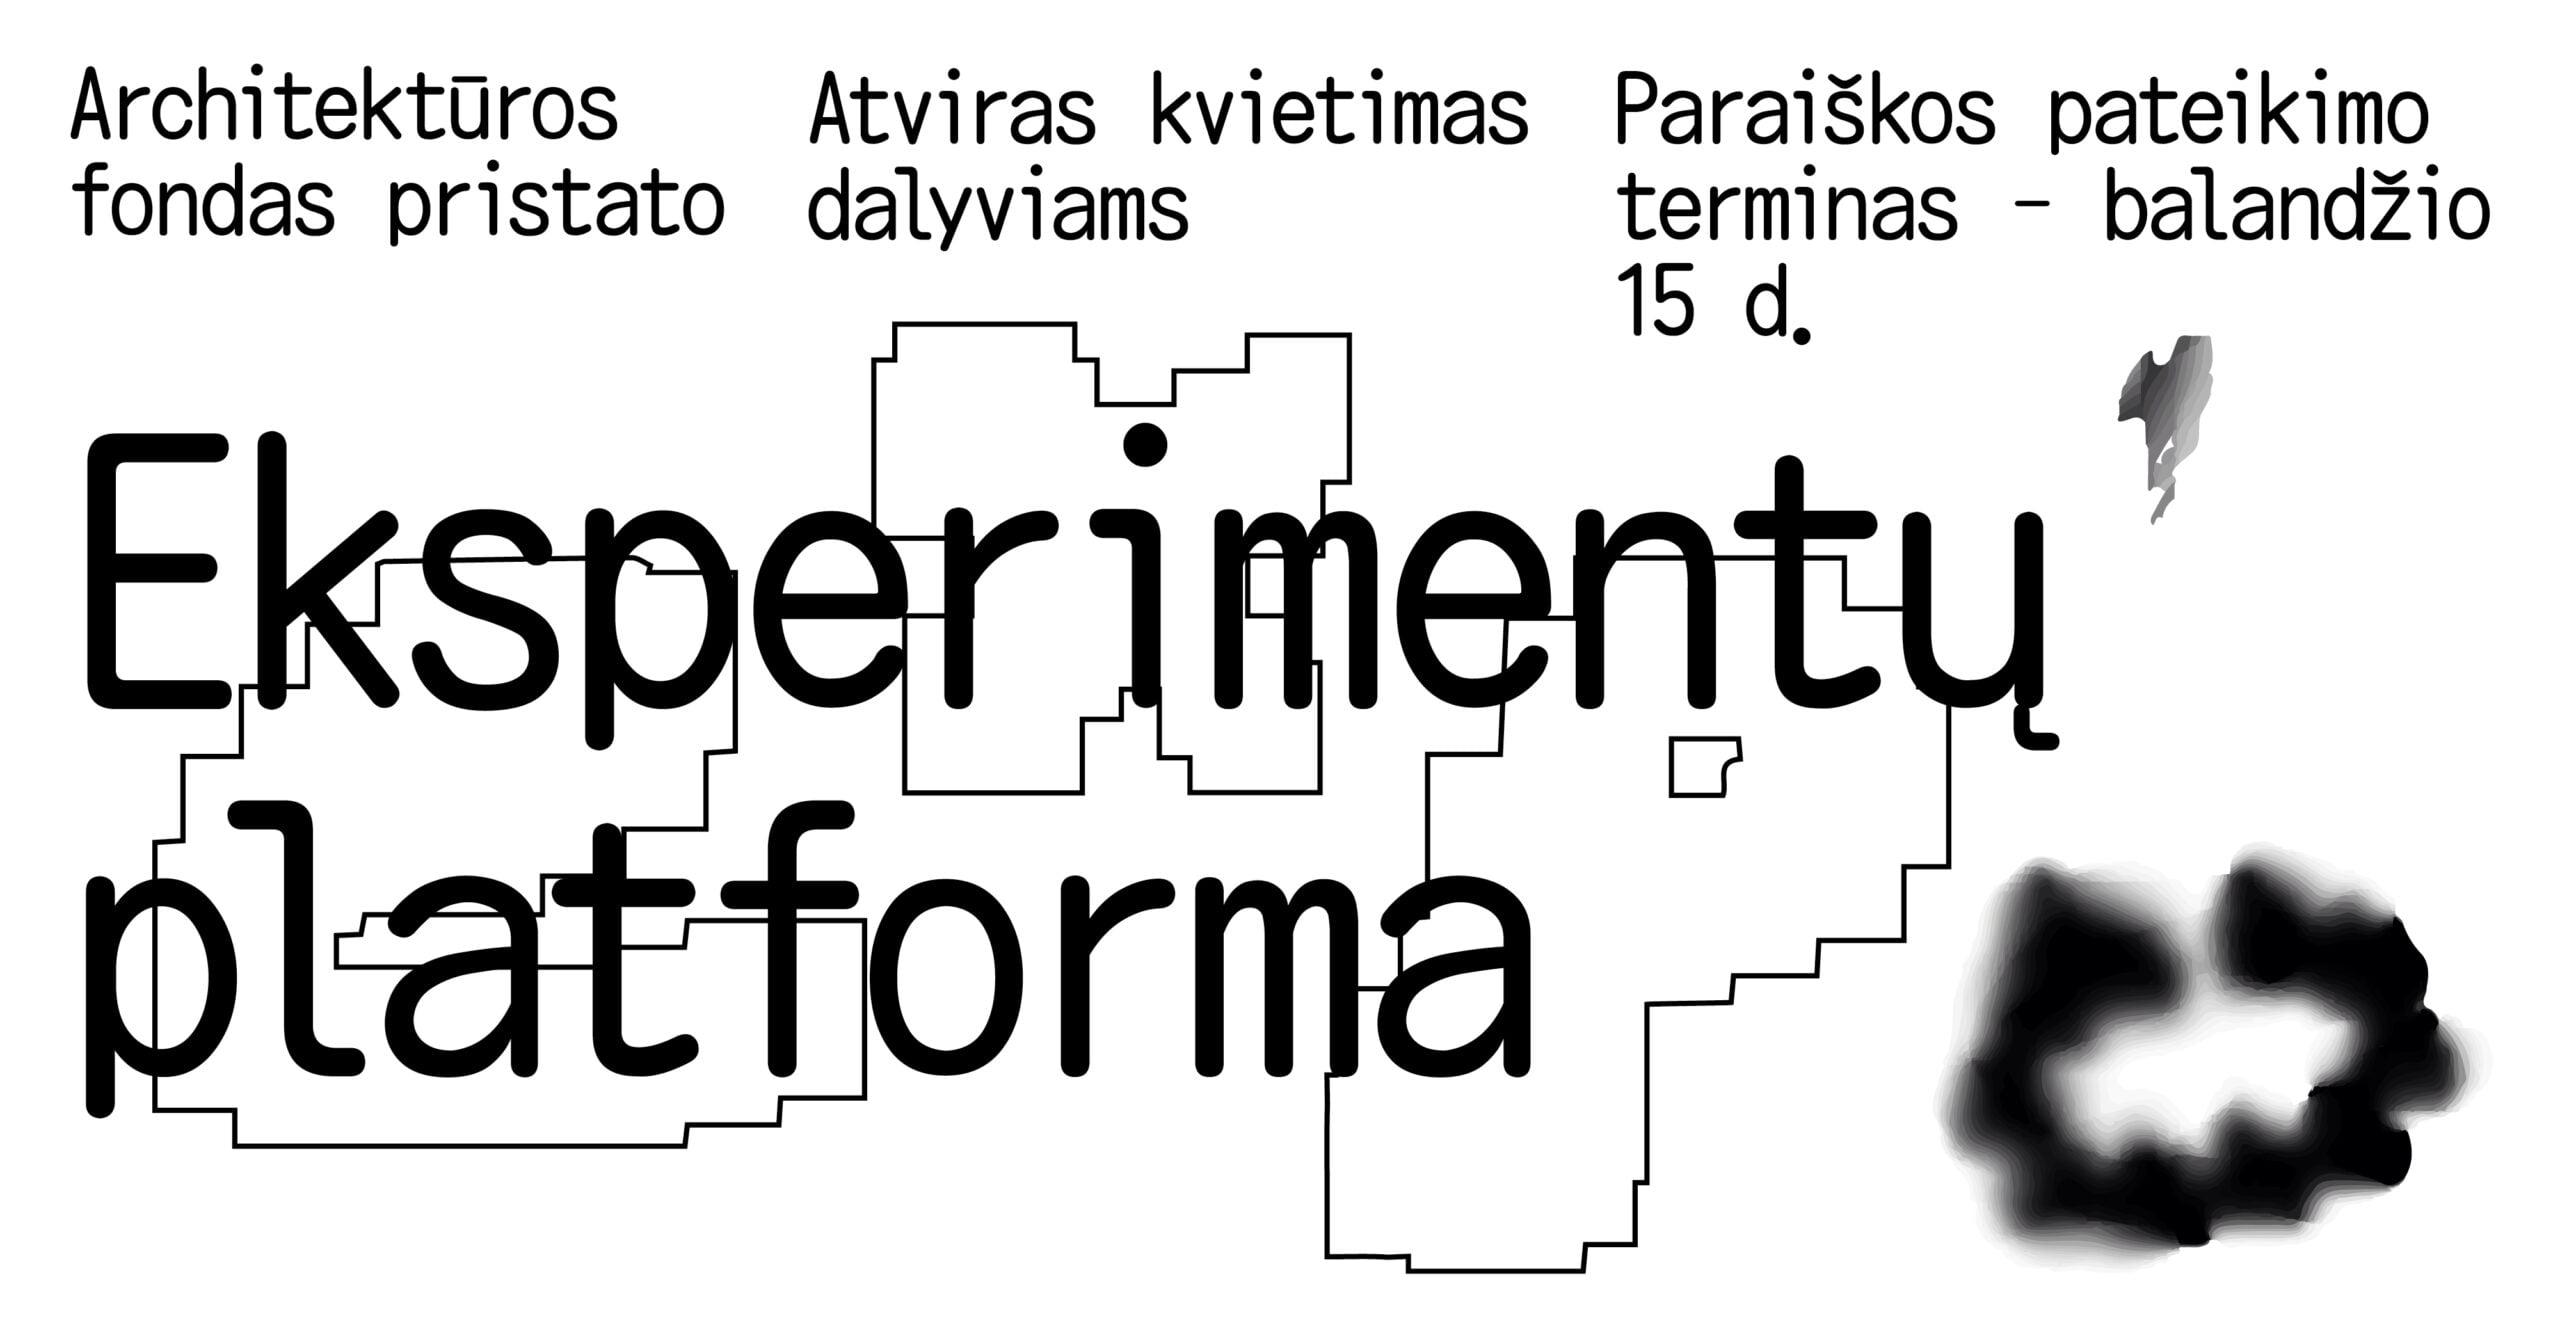 ExP horizontalus Architekturos fondas scaled